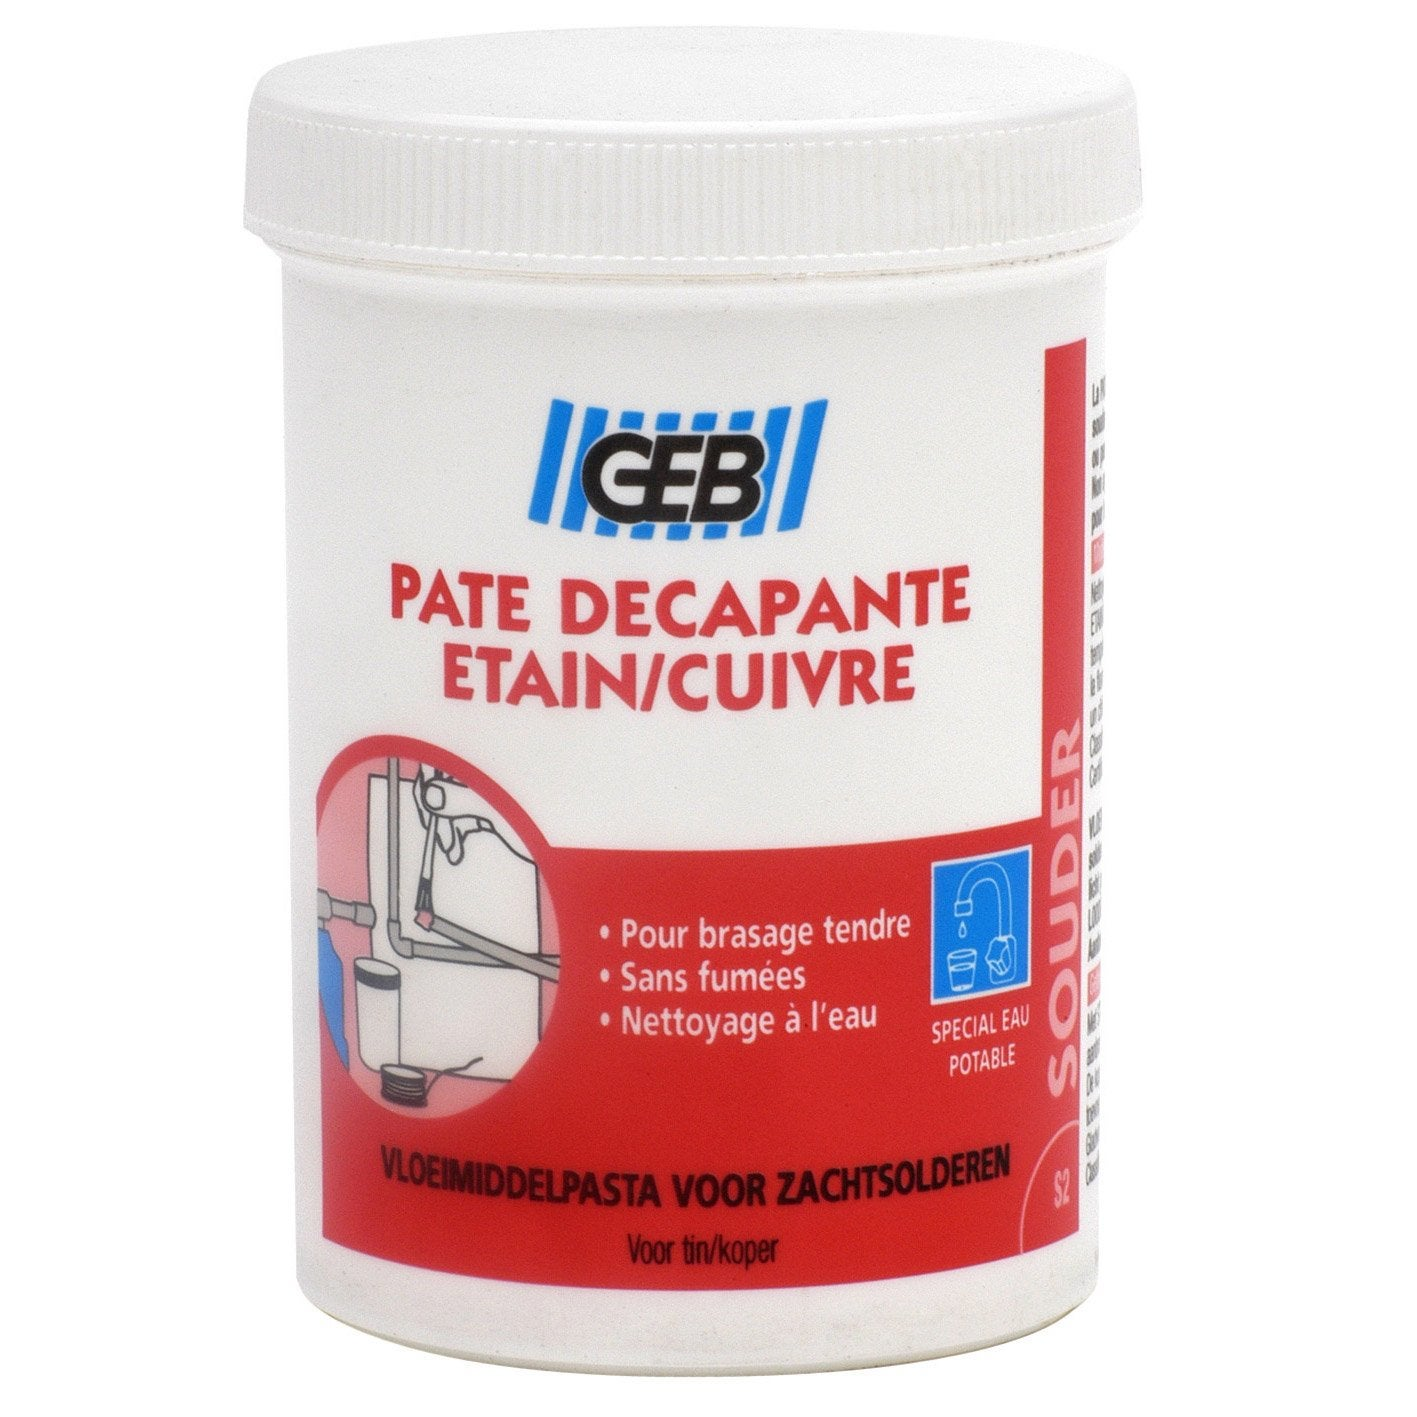 P te d capante etain cuivre 150 ml geb leroy merlin - Produit pour nettoyer l etain ...